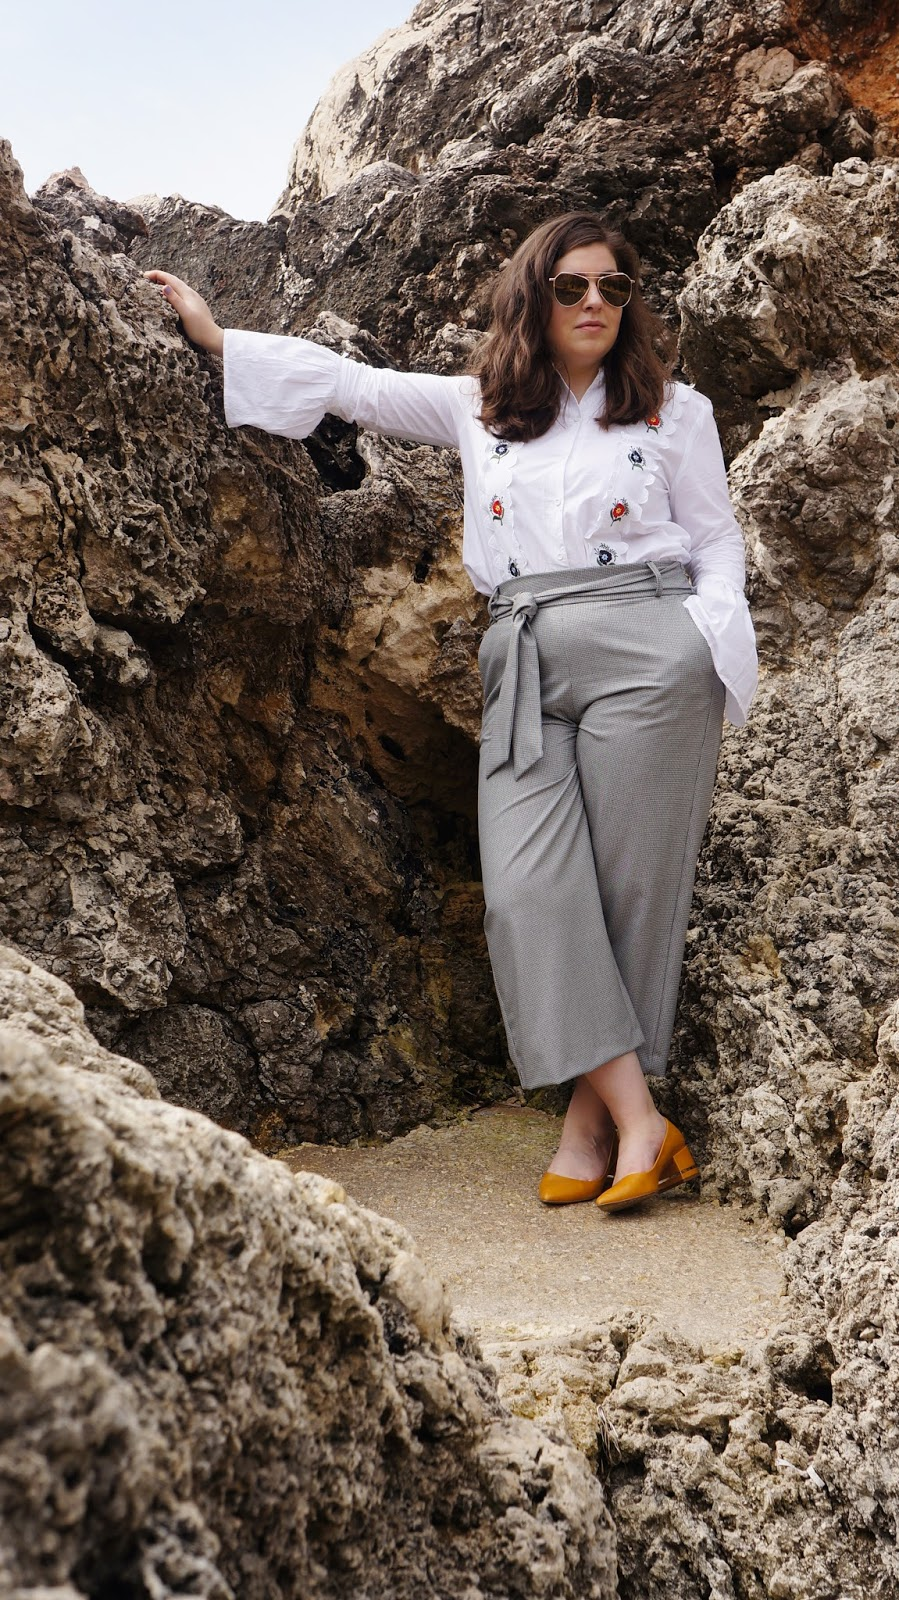 Topshop Shirt, Zara culottes, Zara shoes, Malta beach